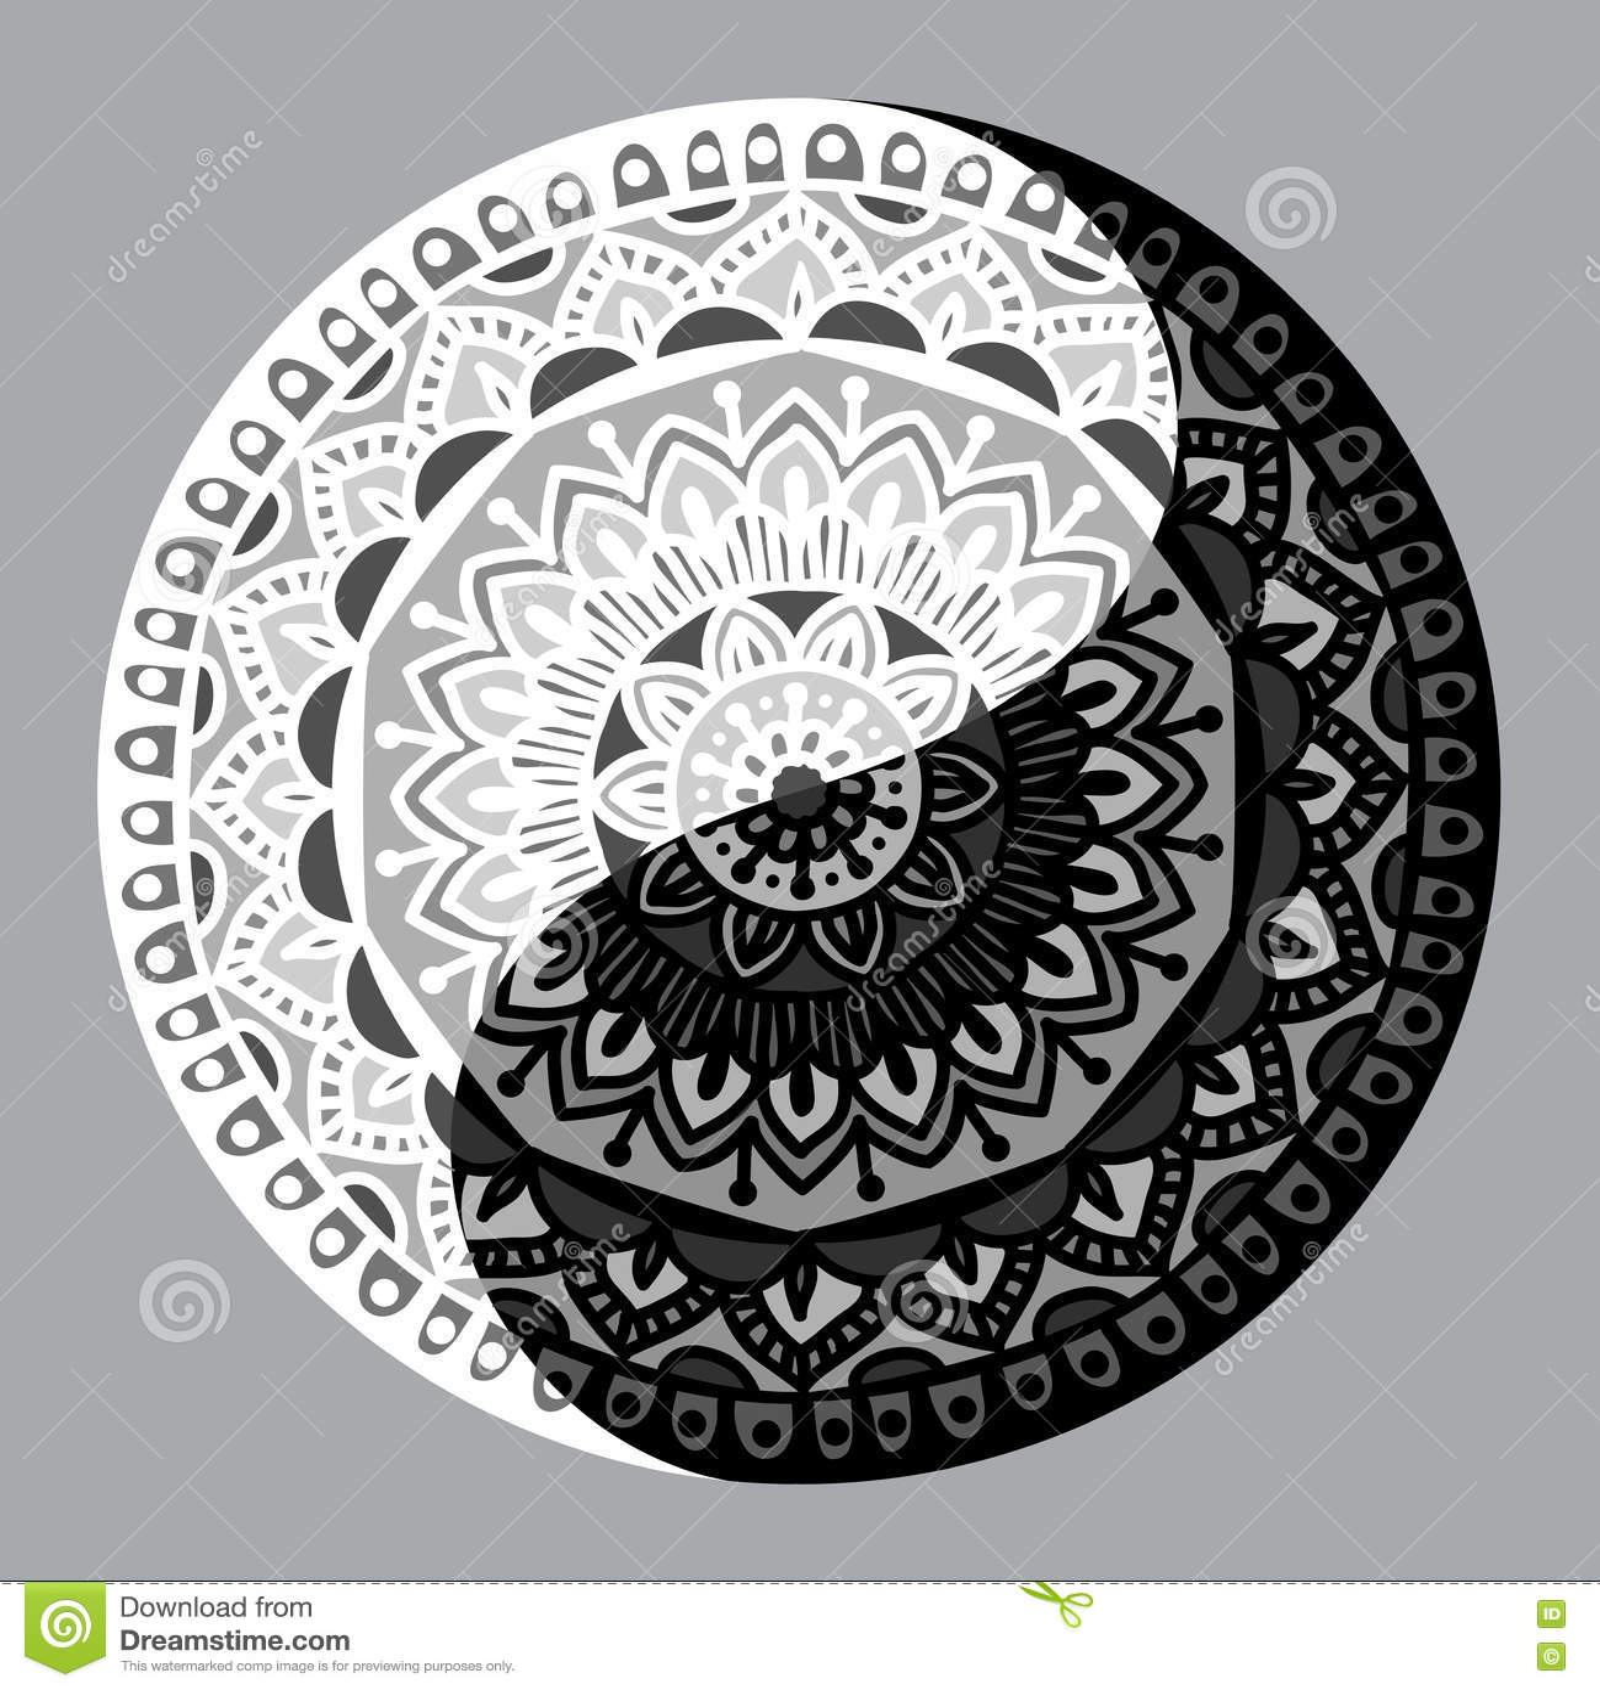 Shape Of Symbol Yin Yang Stock Vector Illustration Of Decoration